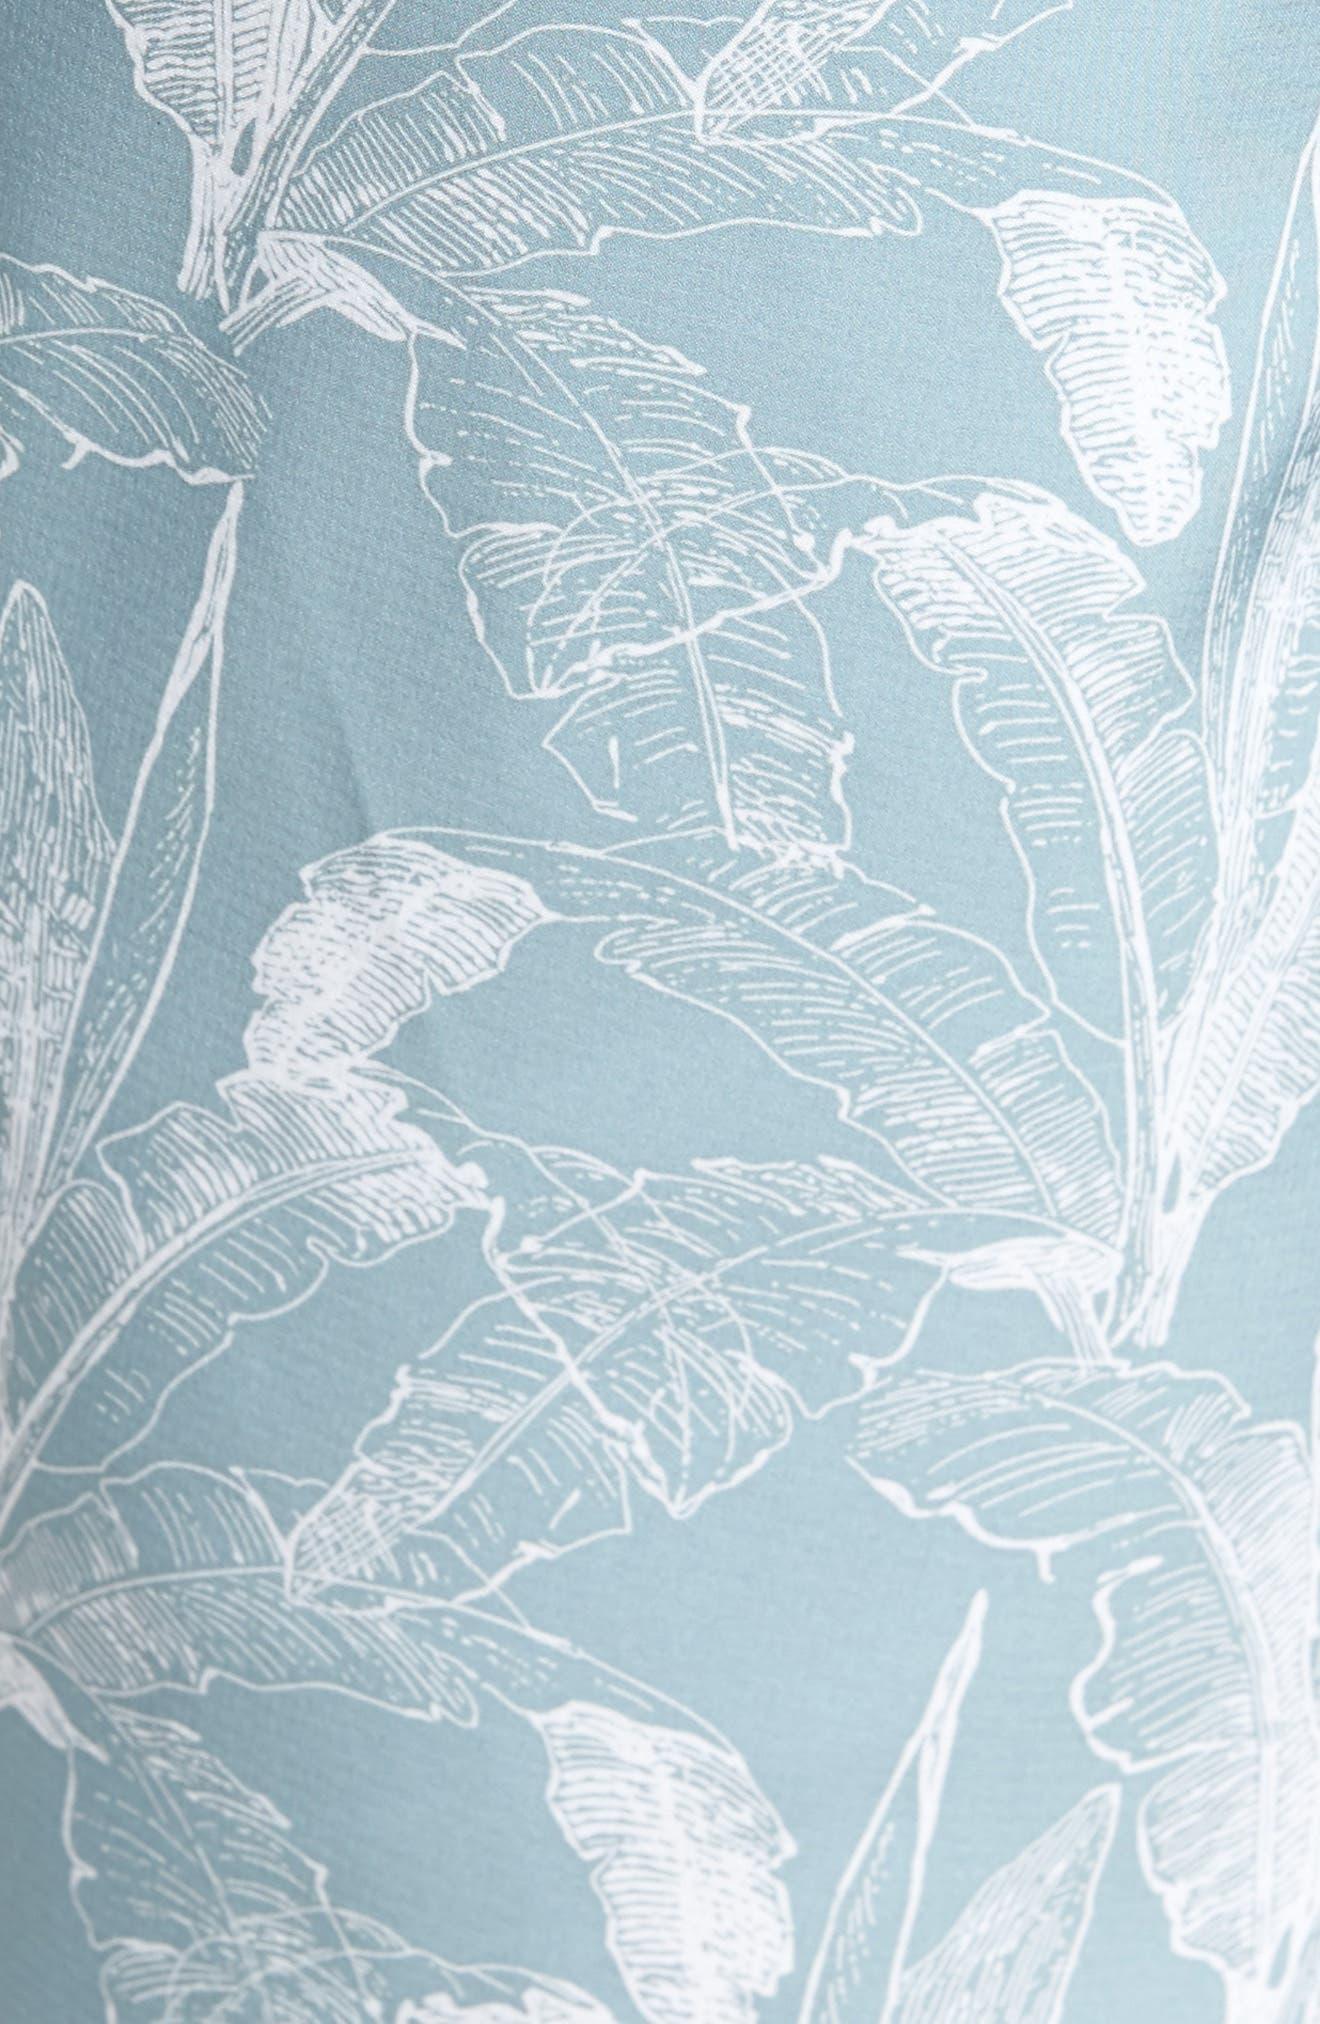 Mirage Print Board Shorts,                             Alternate thumbnail 5, color,                             Arona Blue